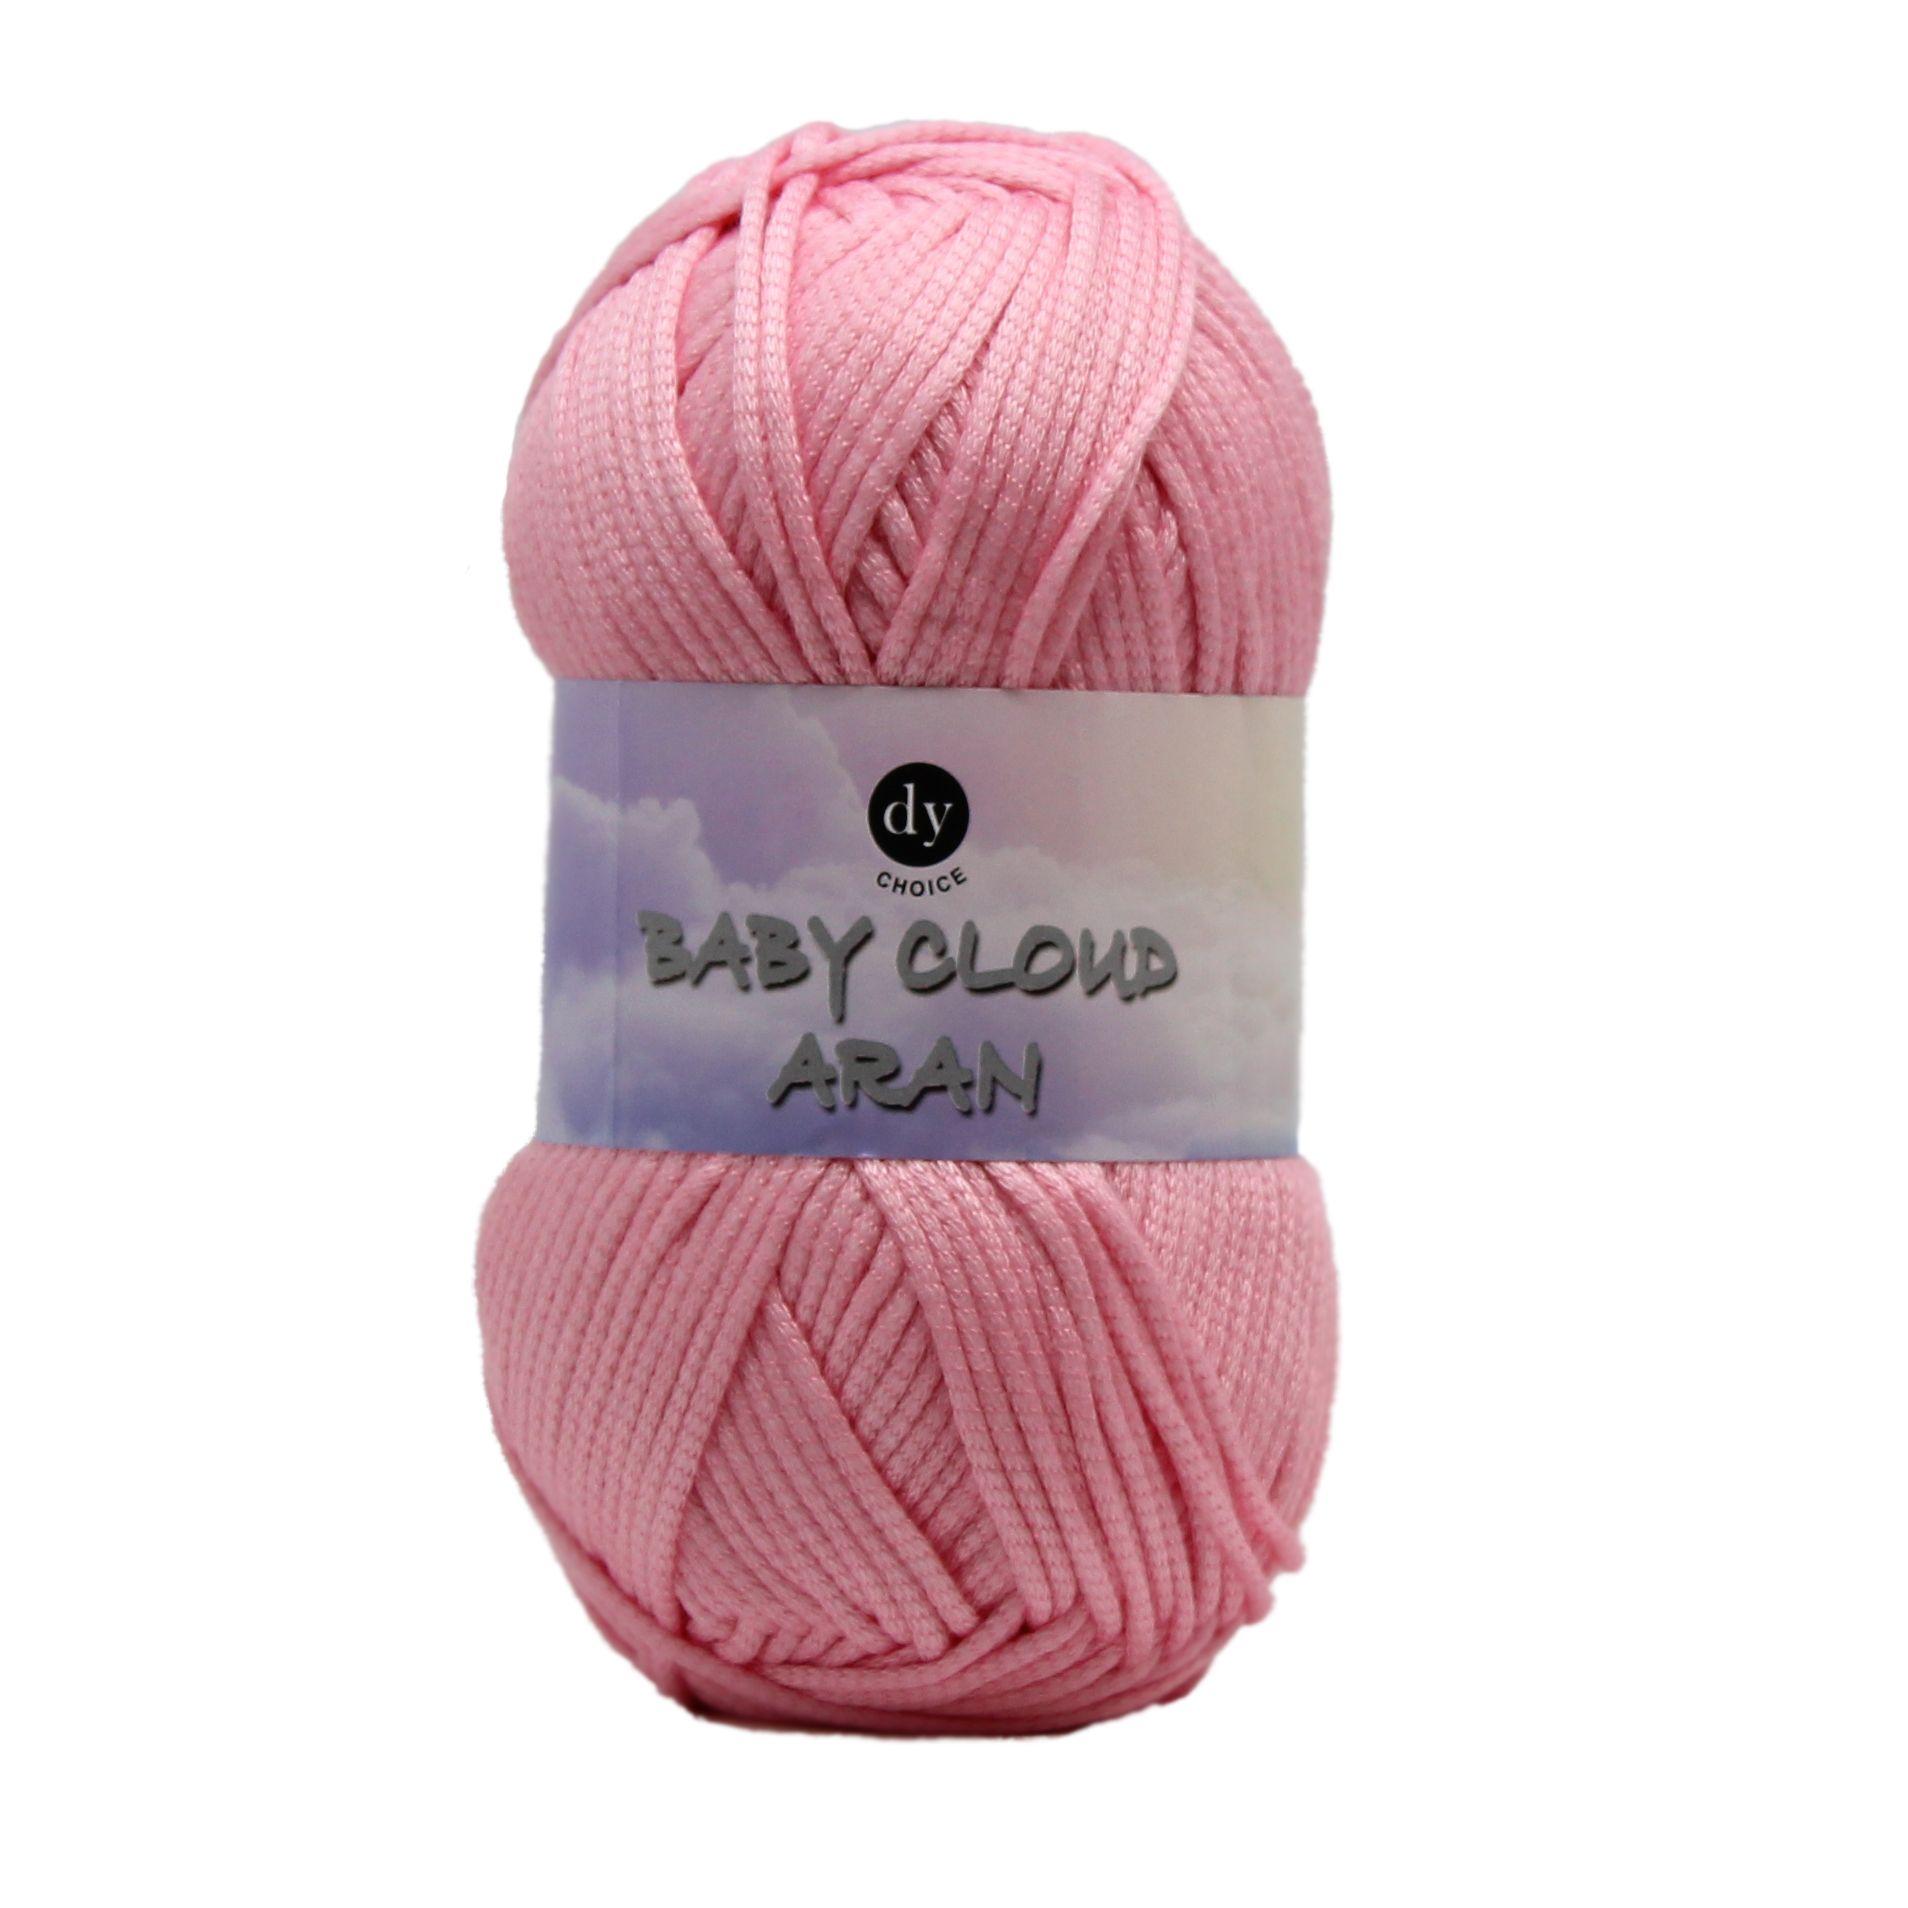 Baby Cloud Aran : DY Choice : Designer Yarns   Baby Knitting   Pinterest